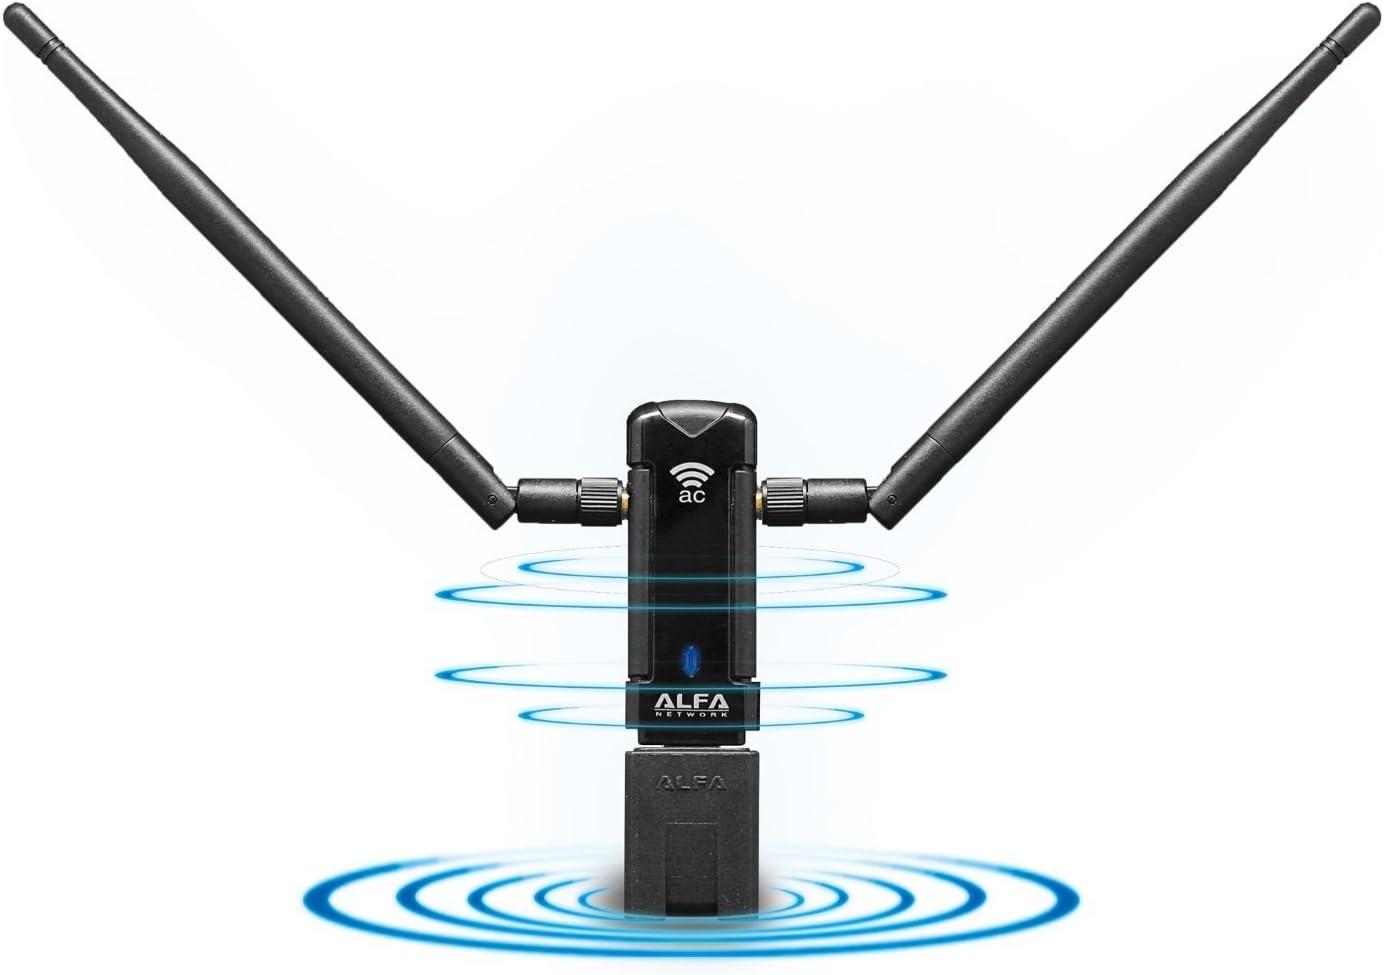 Alfa Network AWUS036AC - Adaptador de Red USB (WiFi, 2.4-5 GHz, 2 x Antenas)